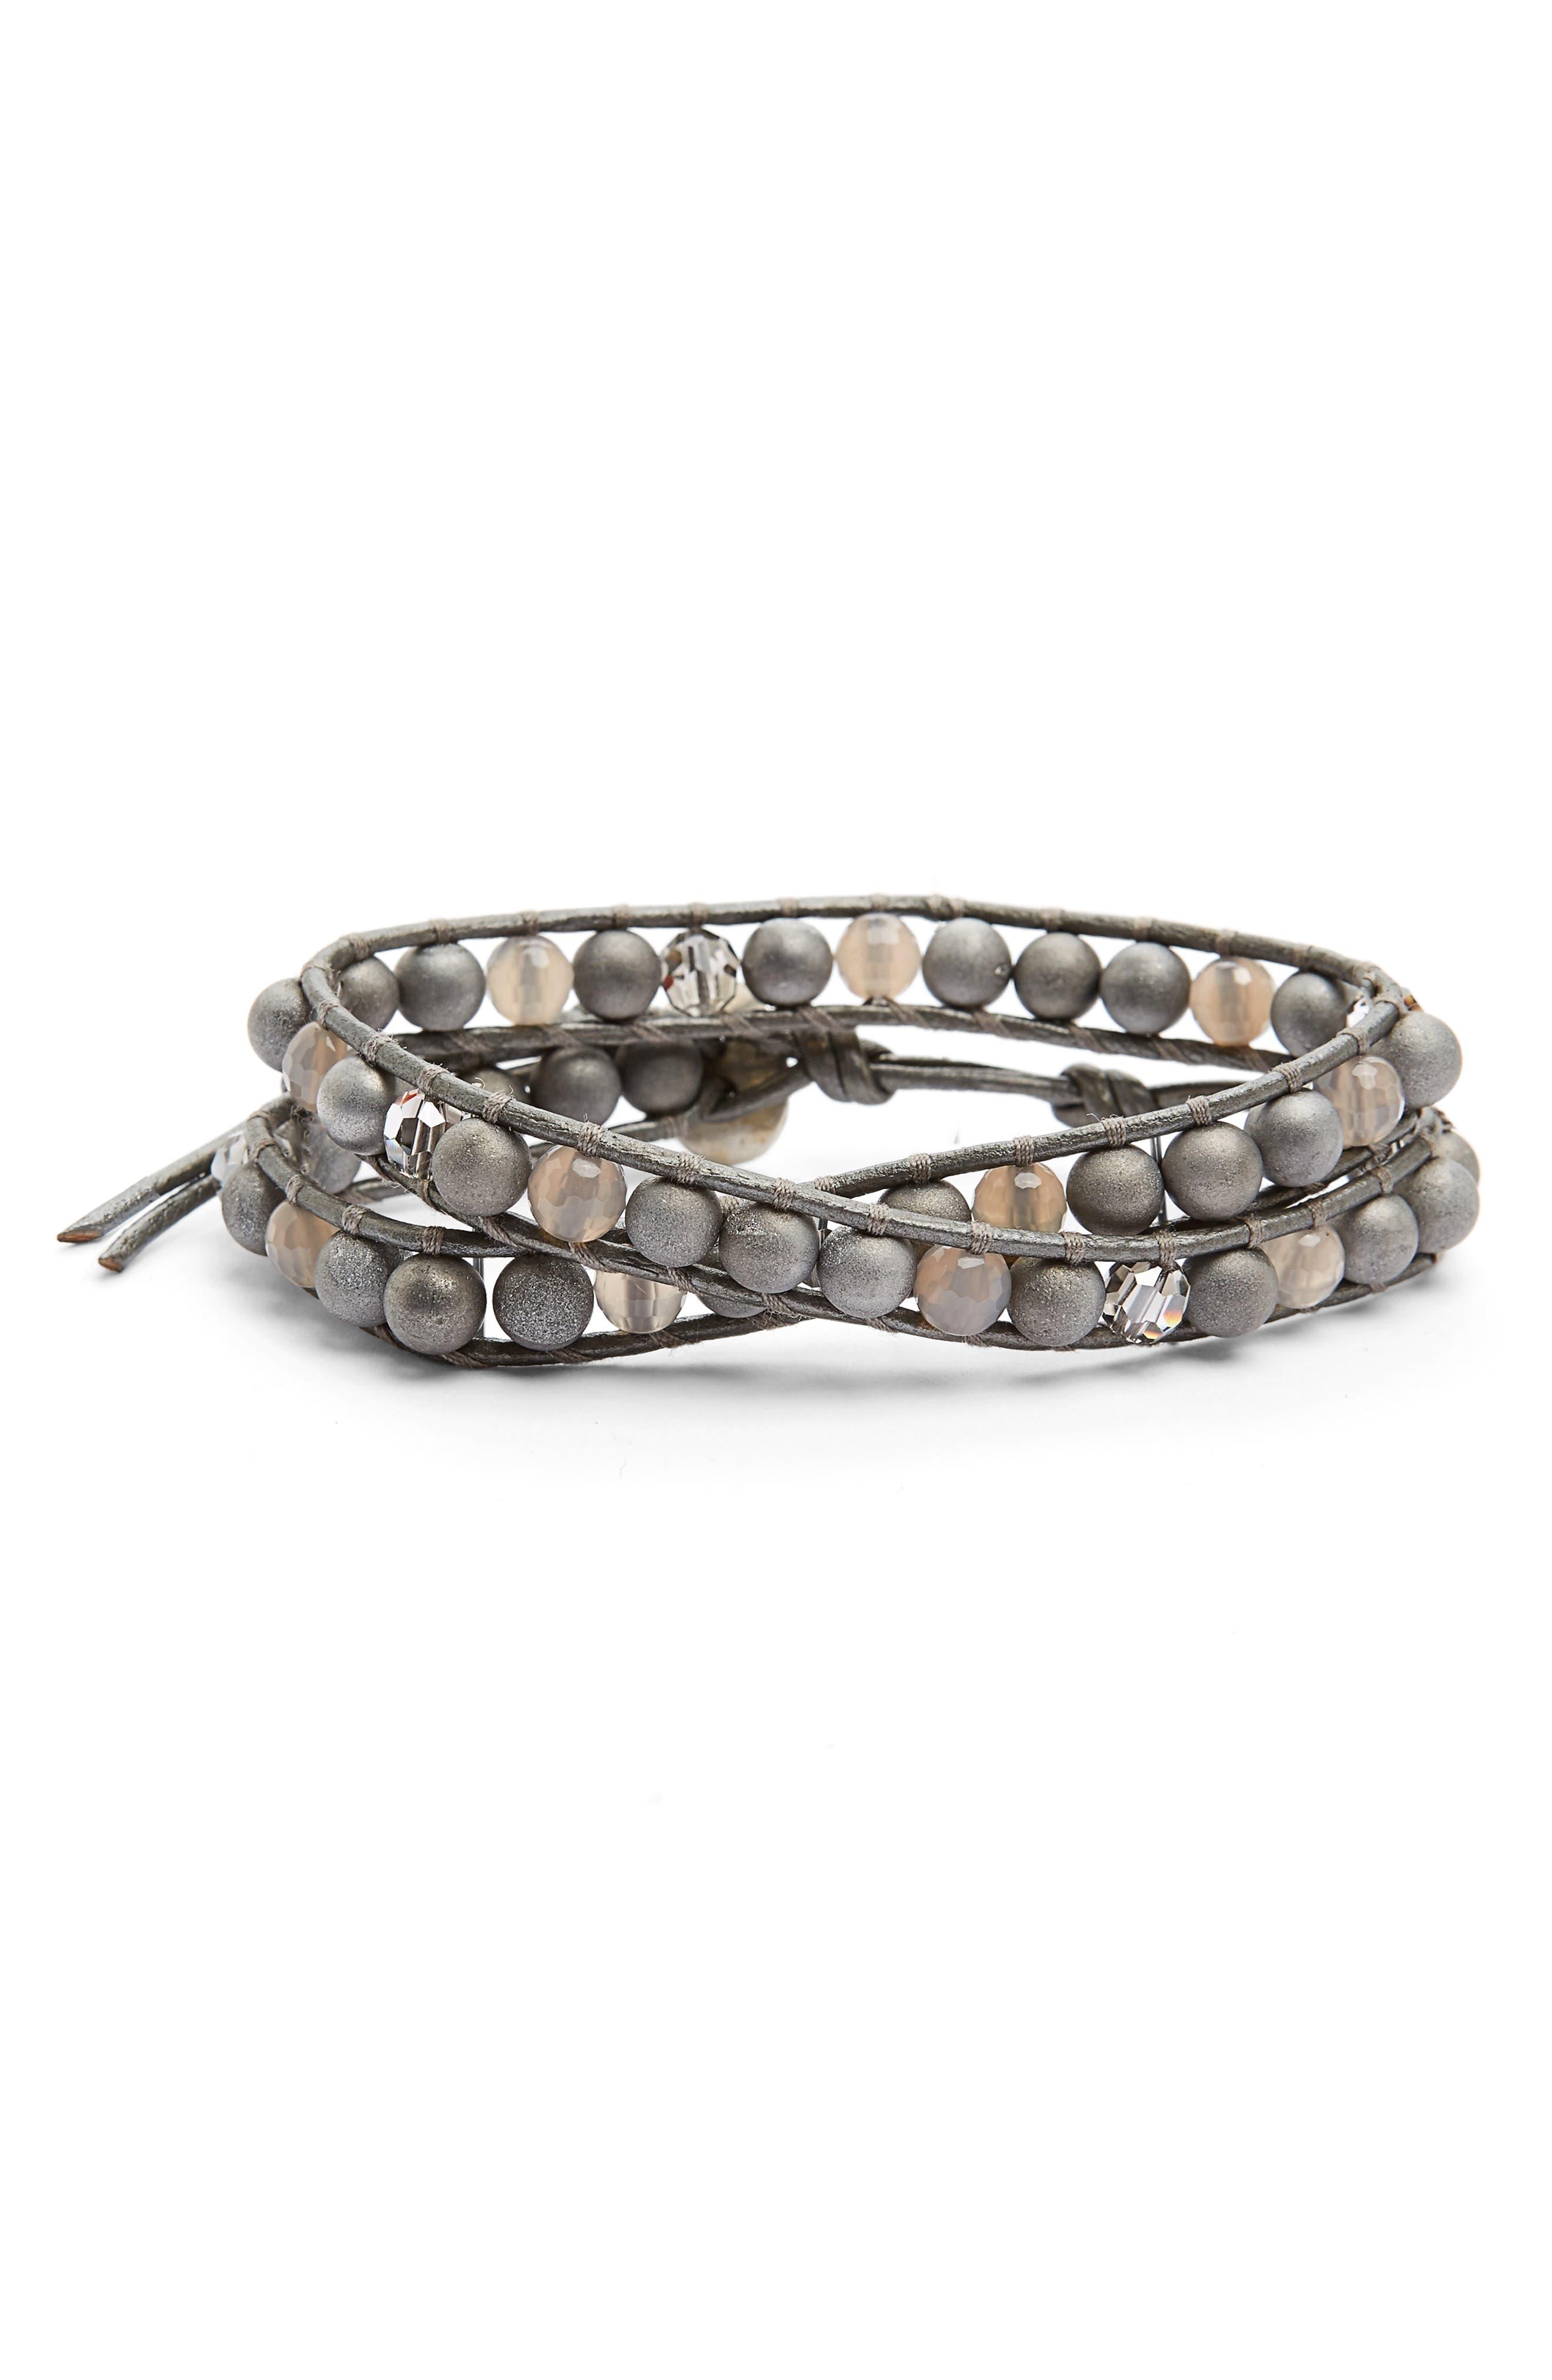 Main Image - Chan Luu Silver Agate & Crystal Wrap Bracelet